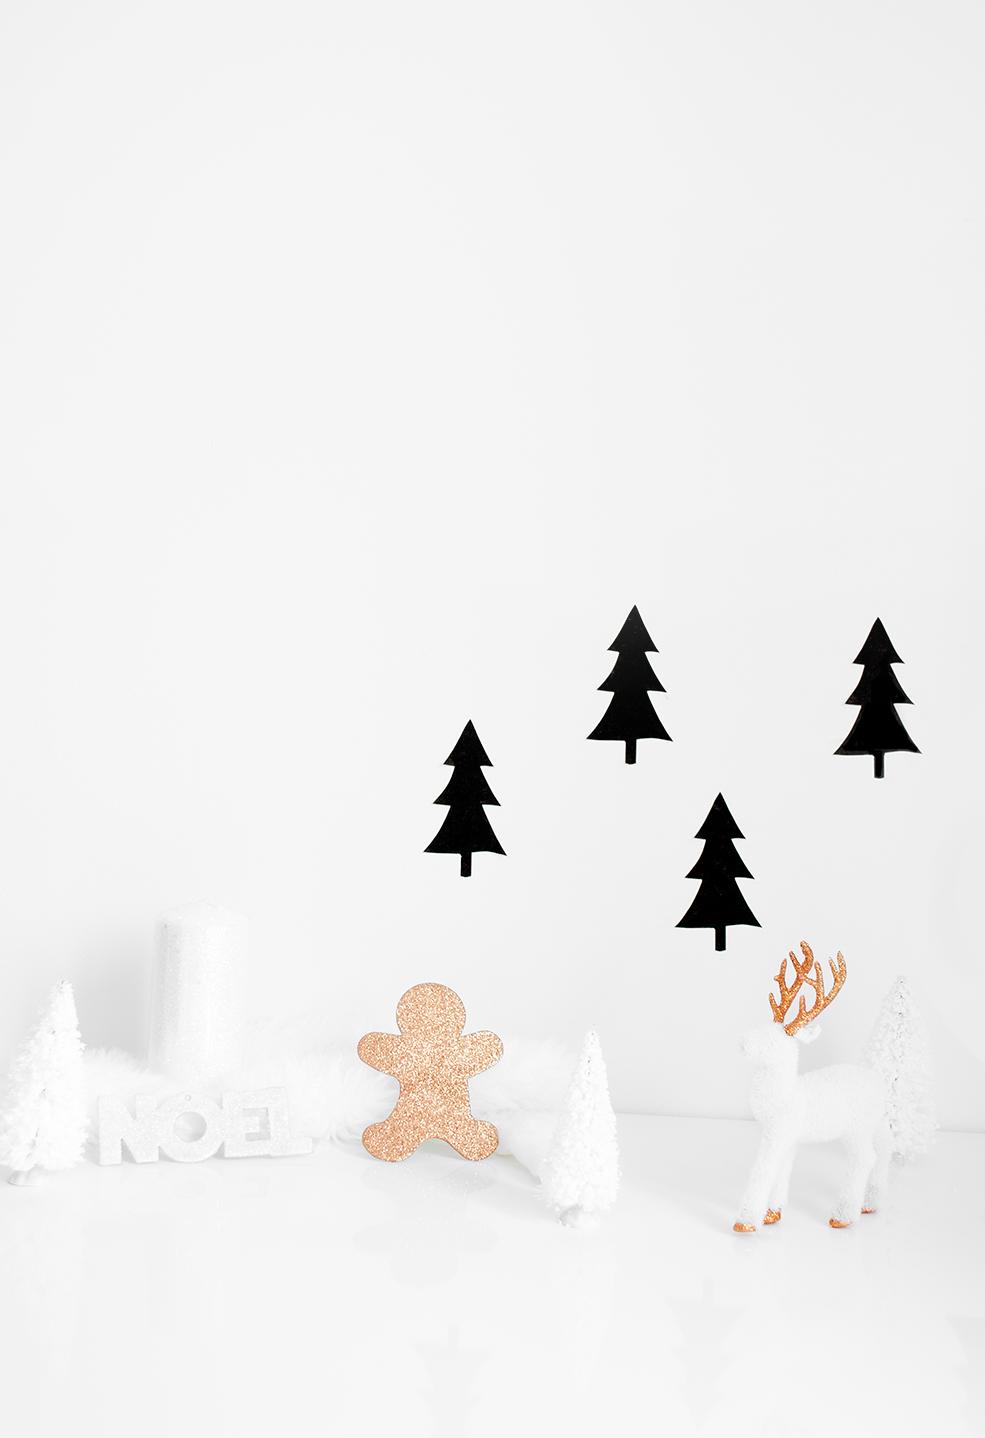 ~ Whimsy Christmas ~